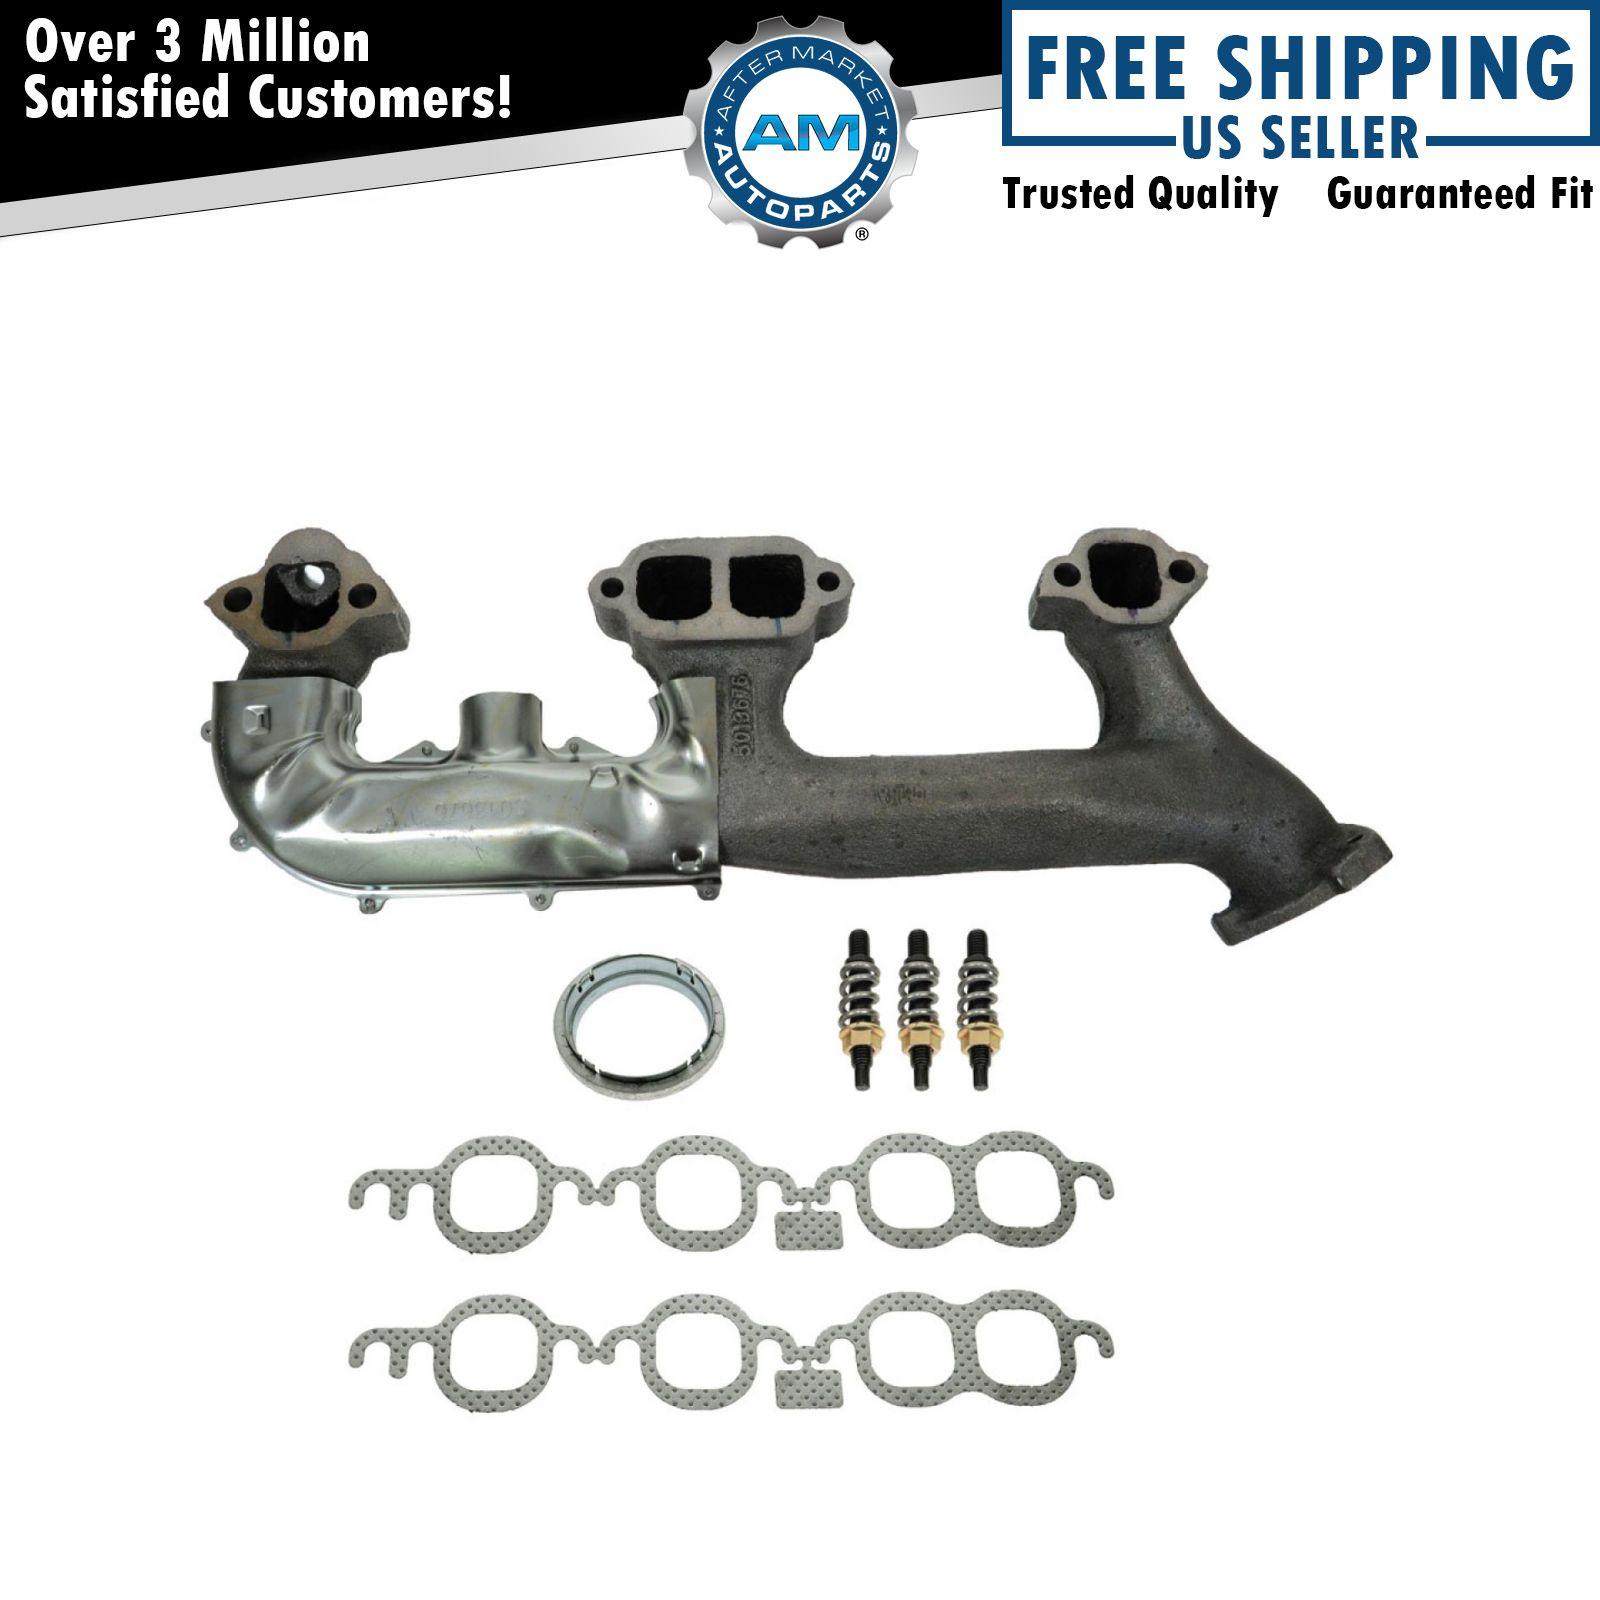 Dorman 674-156 Exhaust Manifold Kit For Chevy GMC Pickup